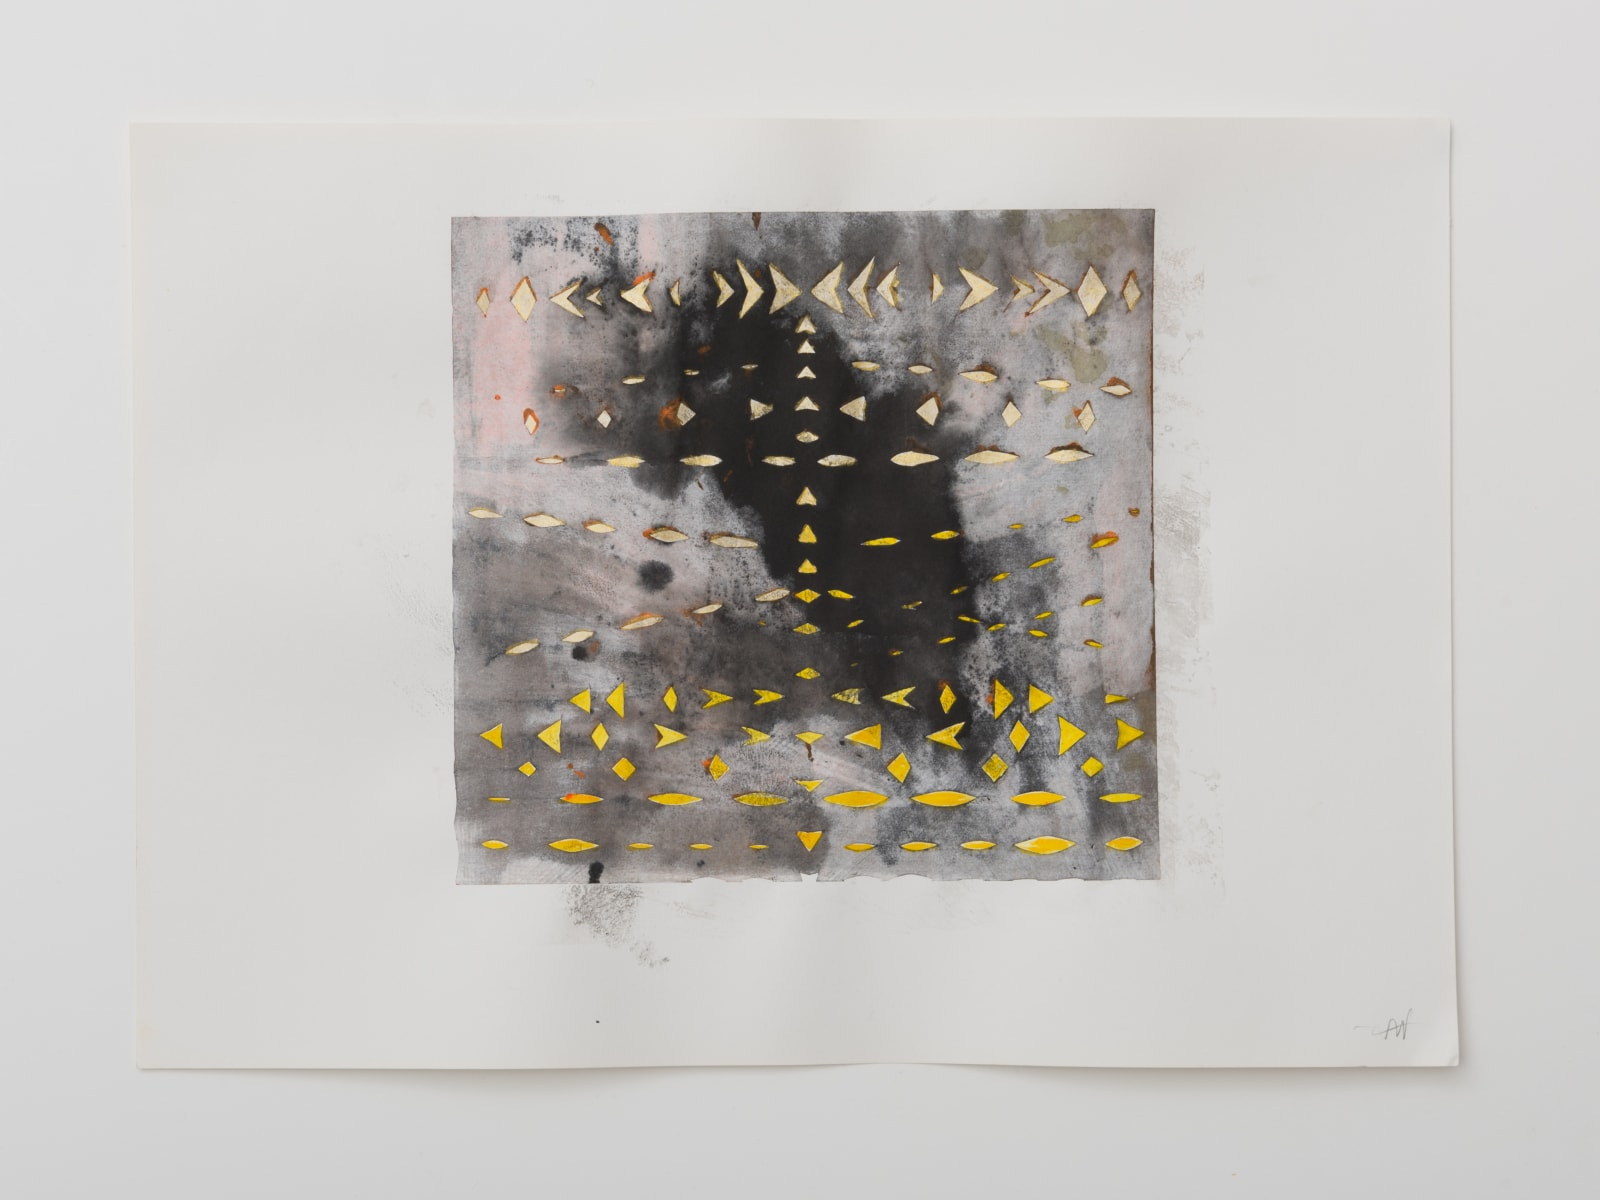 Alison Wilding, Cut Series Large #4, 2020